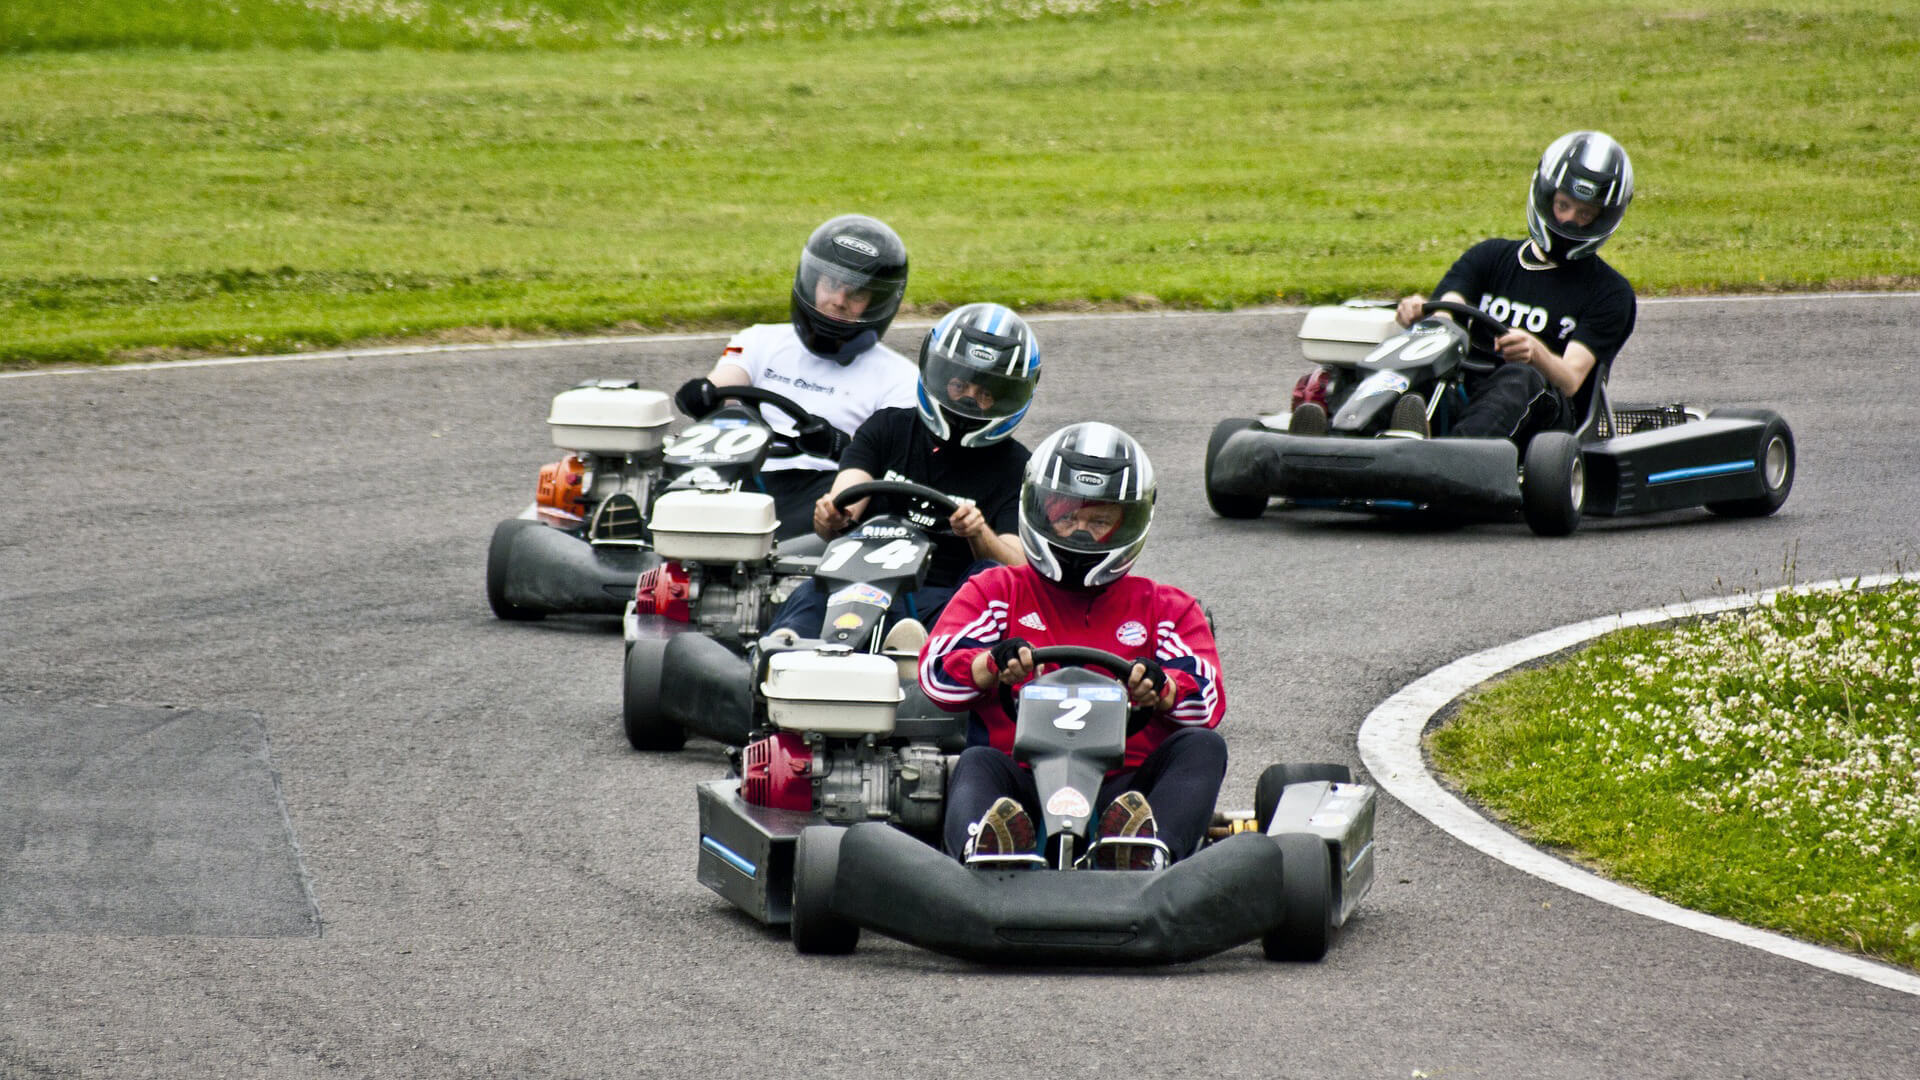 Corridas de Kart